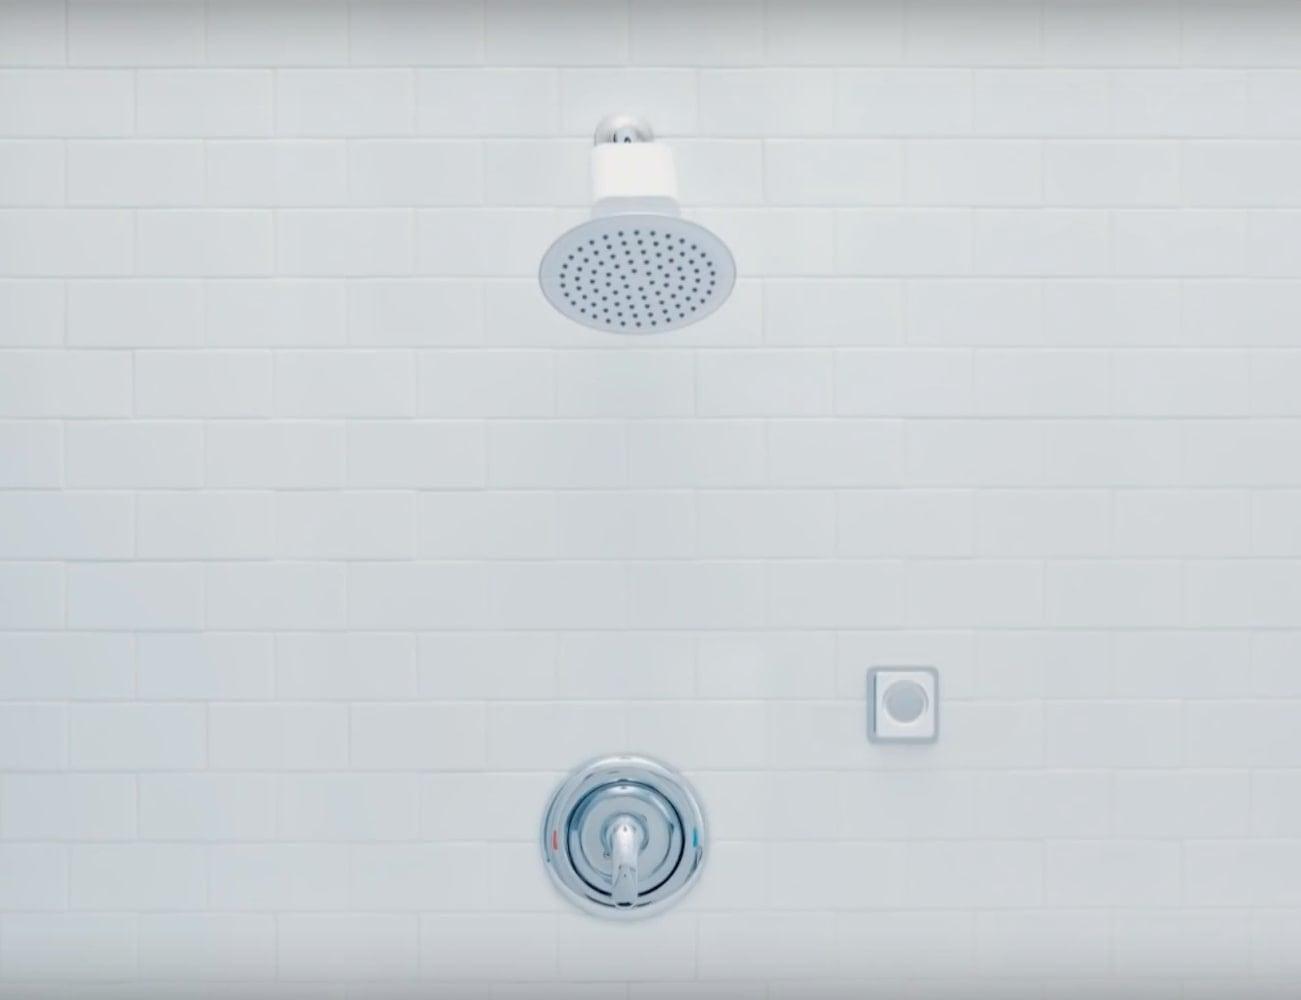 Livin Shower Save Smart Water-Saving Shower Kit